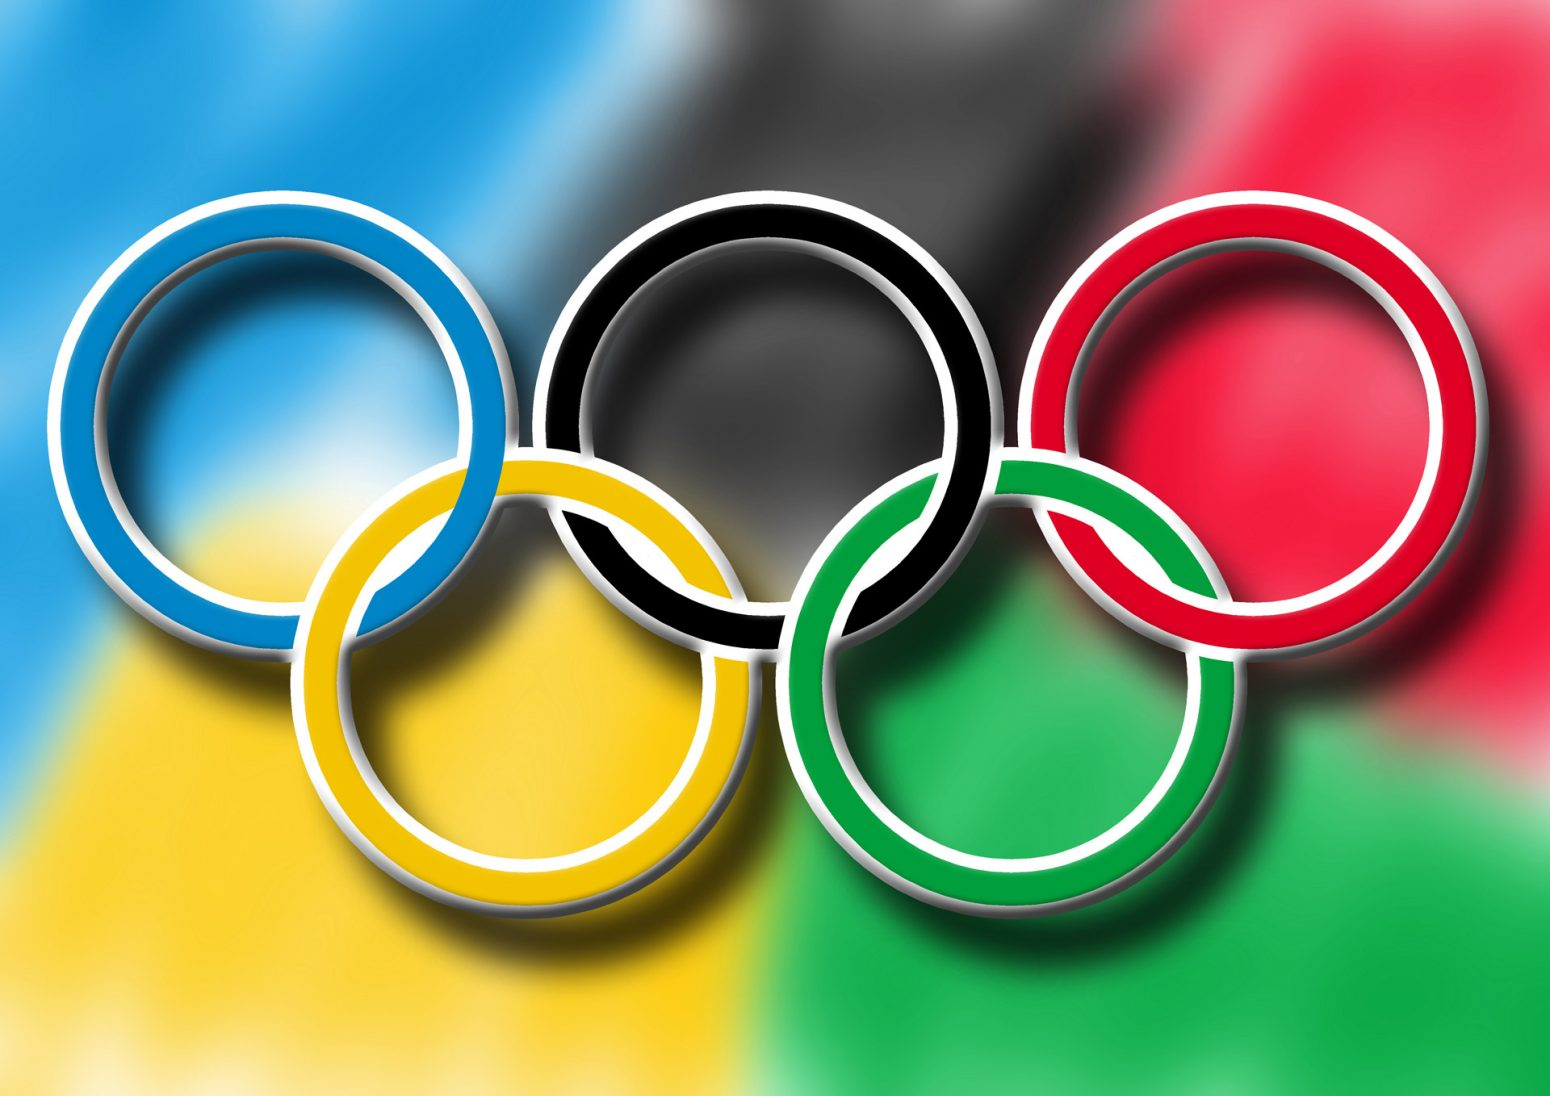 olympicsdreamsoarhighas64indianathletesattainqualification